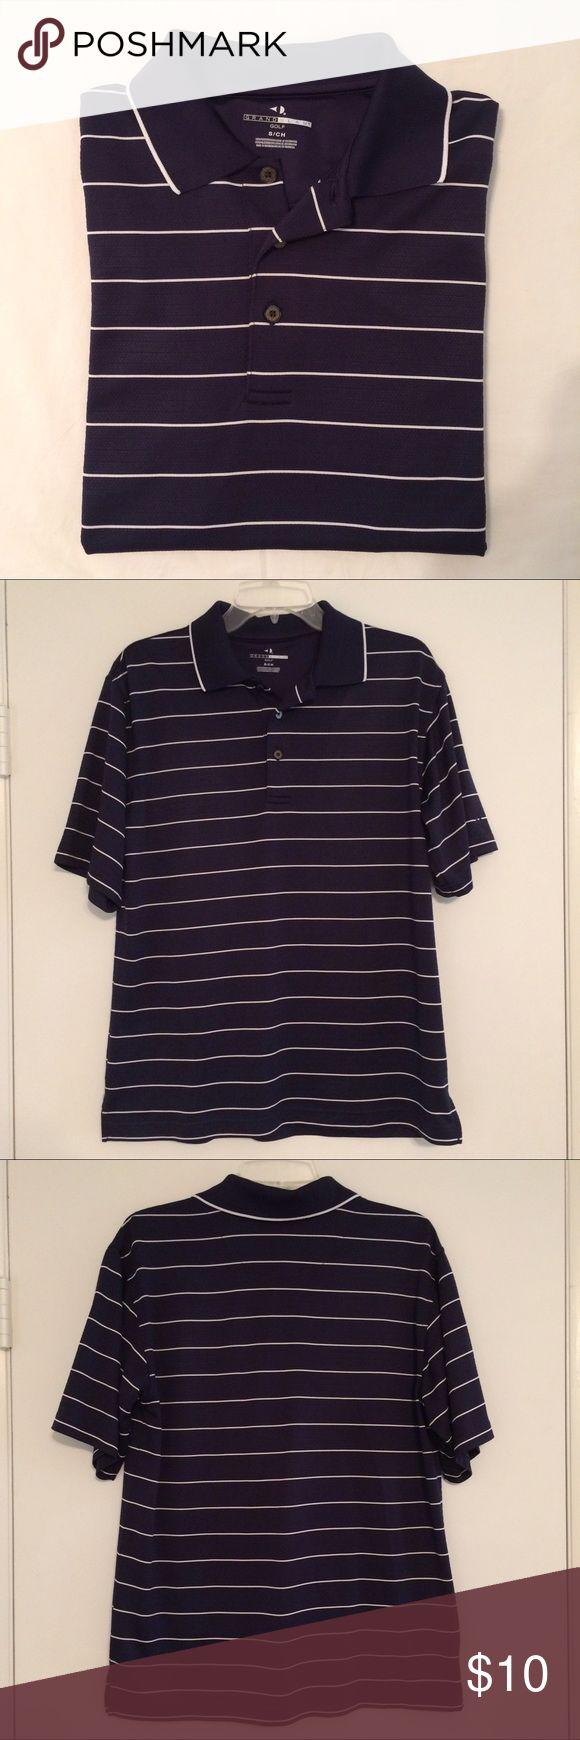 Men's Grand Slam Golf Polo Shirt Men's Grand Slam Golf Polo Shirt Size Small Navy blue and white stripes 100% Polyester Excellent Condition! Grand Slam Shirts Polos